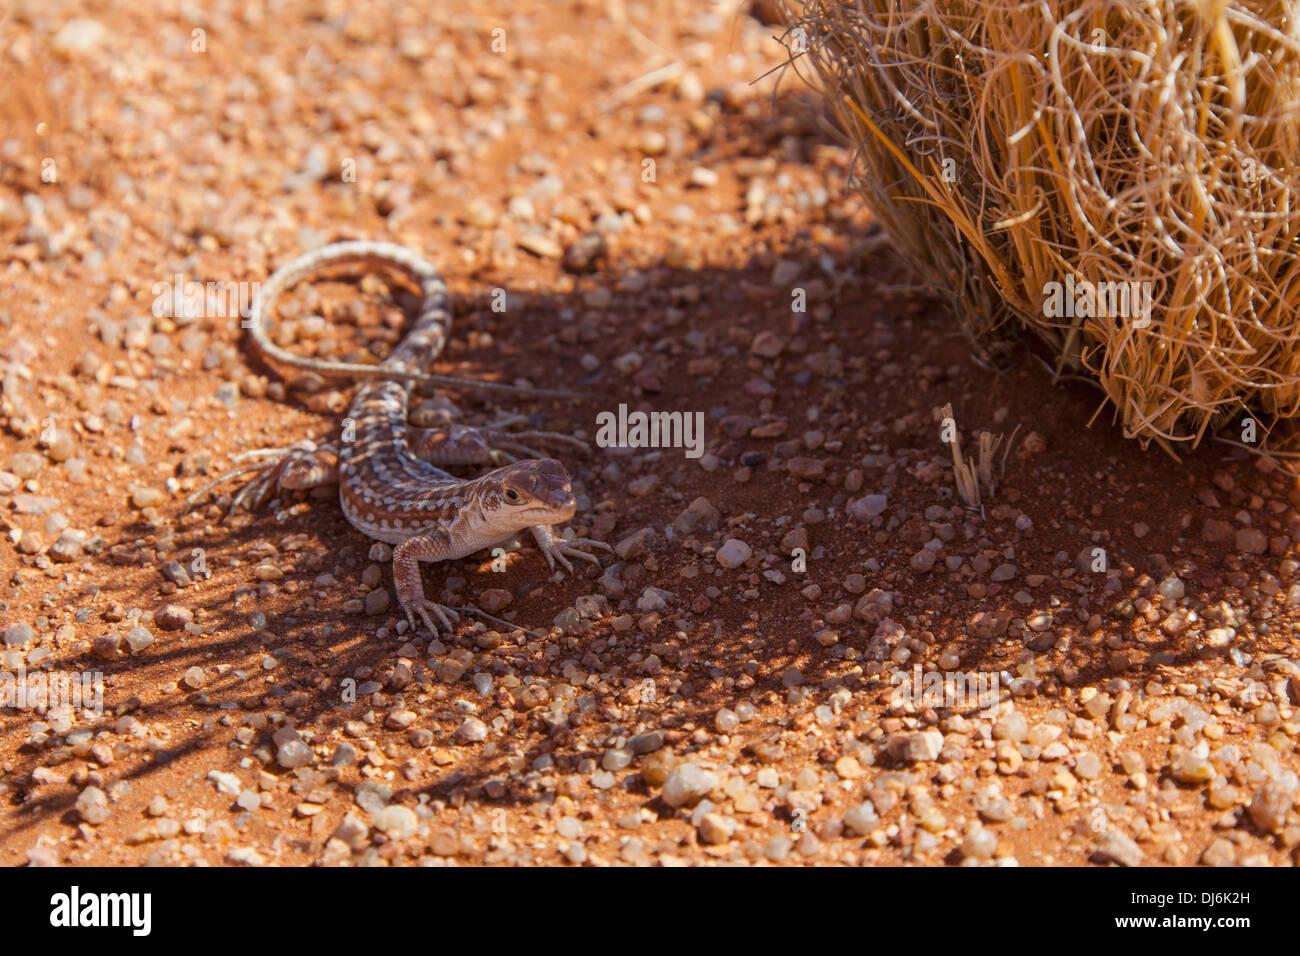 Gecko Next To Legendary Namibian Road D707; Namibia - Stock Image